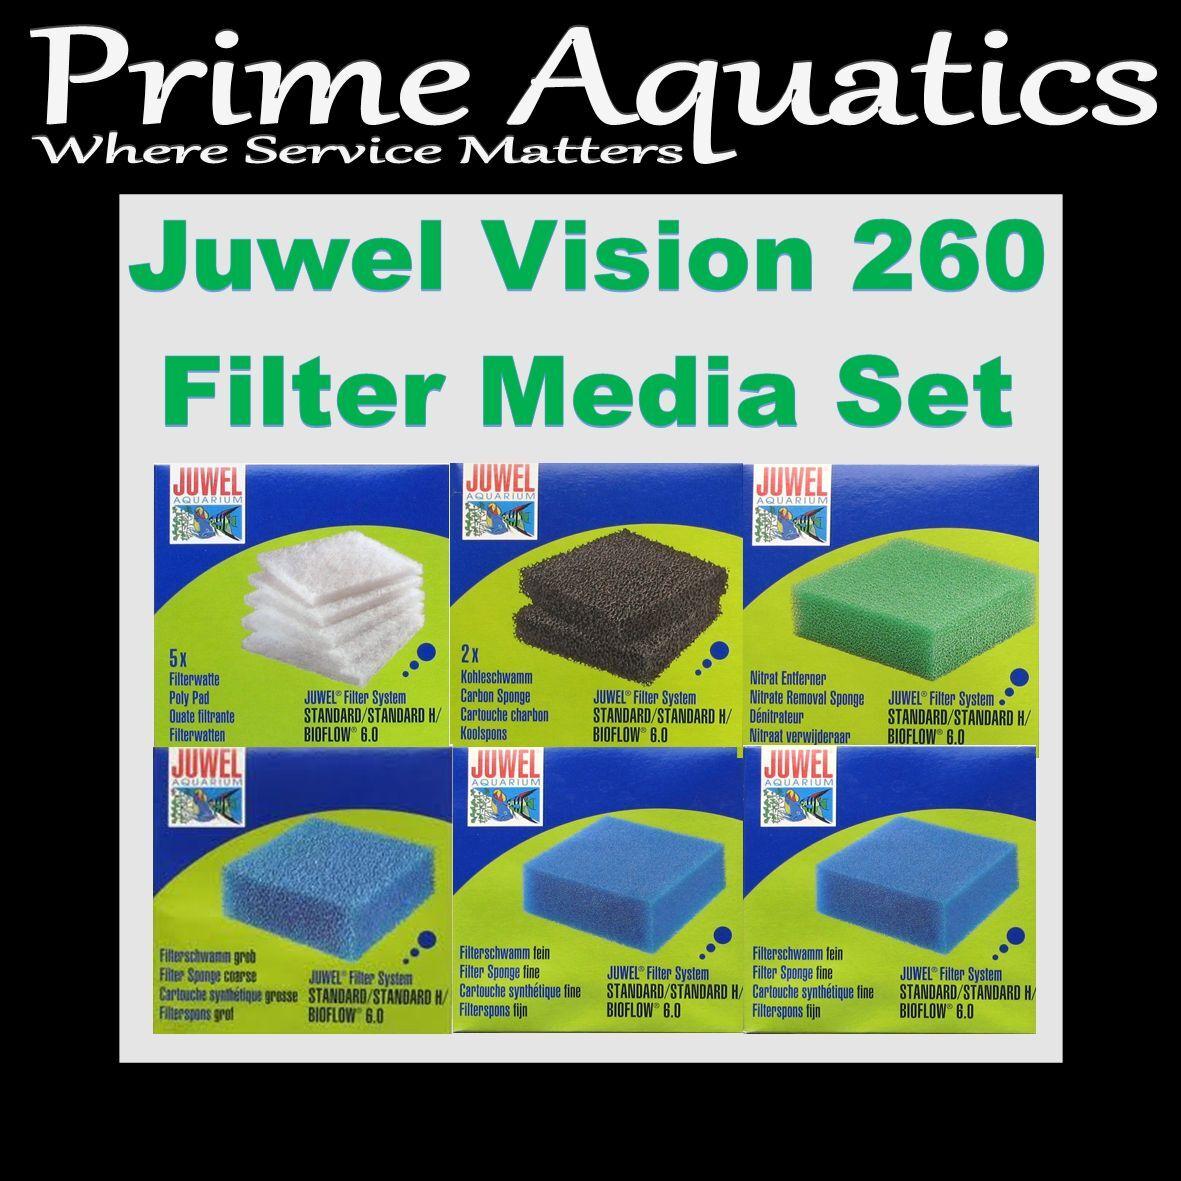 JUWEL VISION 260 COMPLETO Autentico Filtro Media Media Media Set Nuovo in Scatola 60b427